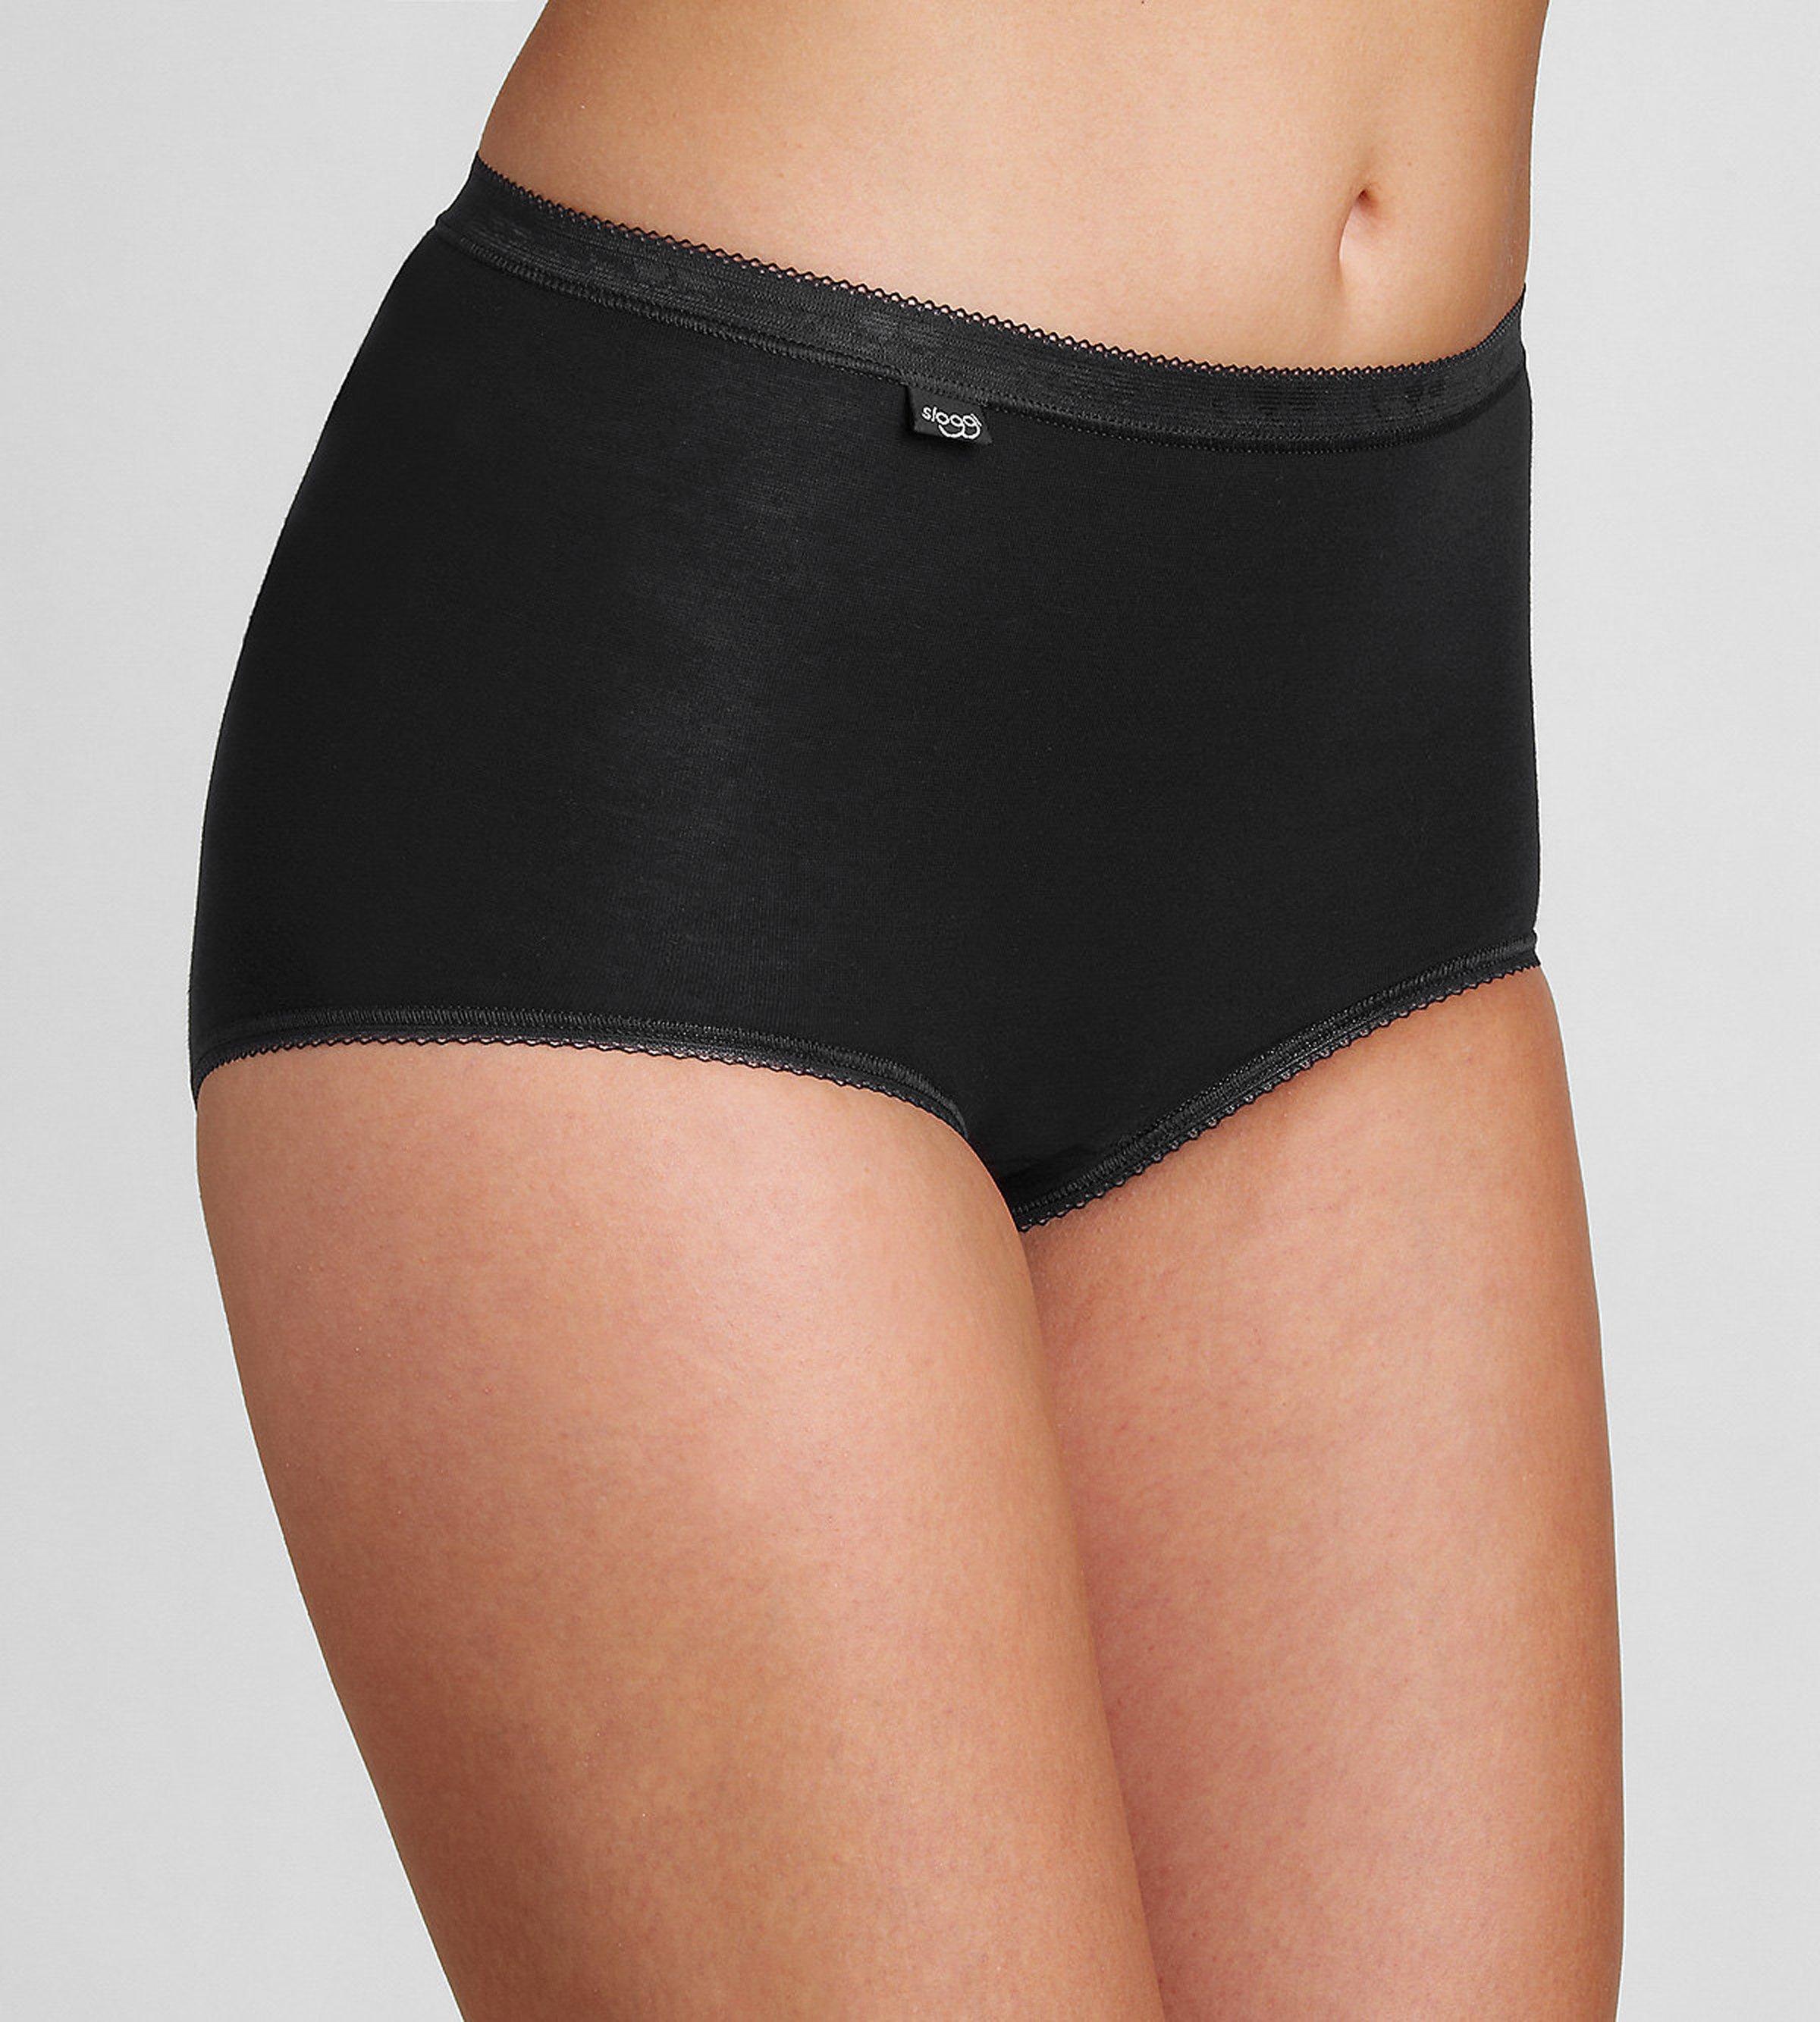 Sloggi Women's Basic + Maxi 4 Pack Underwear Various Colours - 10 Black